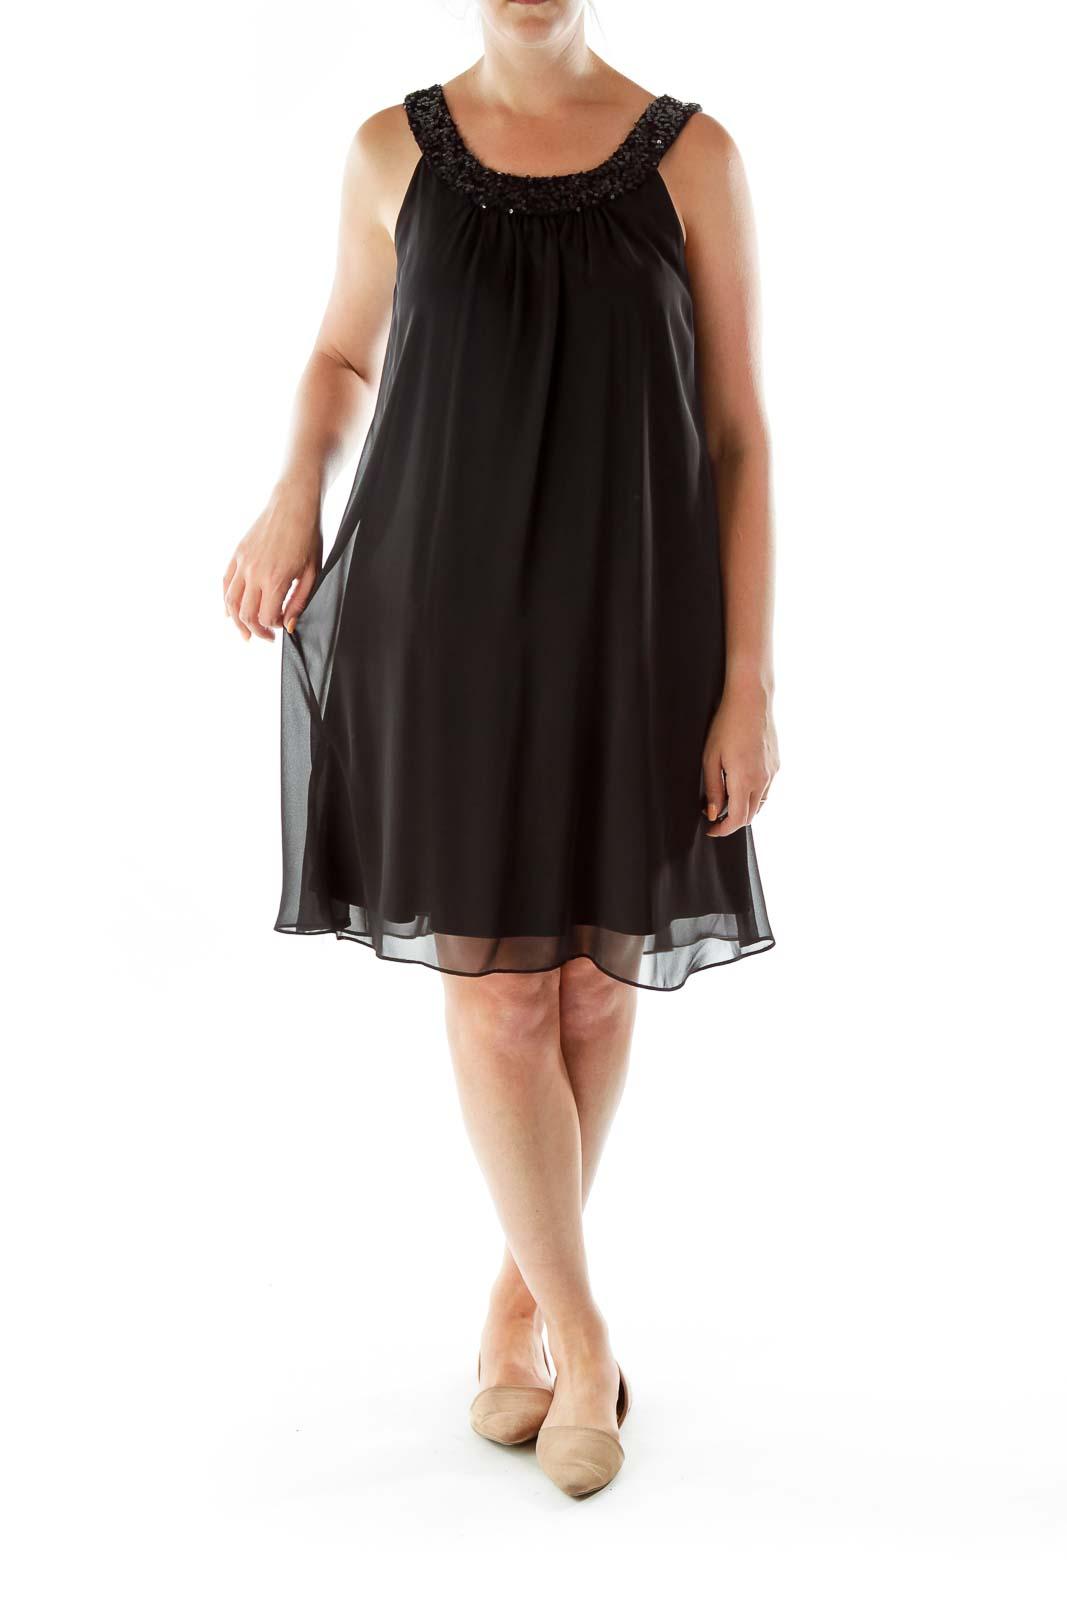 Black Sequined Sleeveless Shift Dress